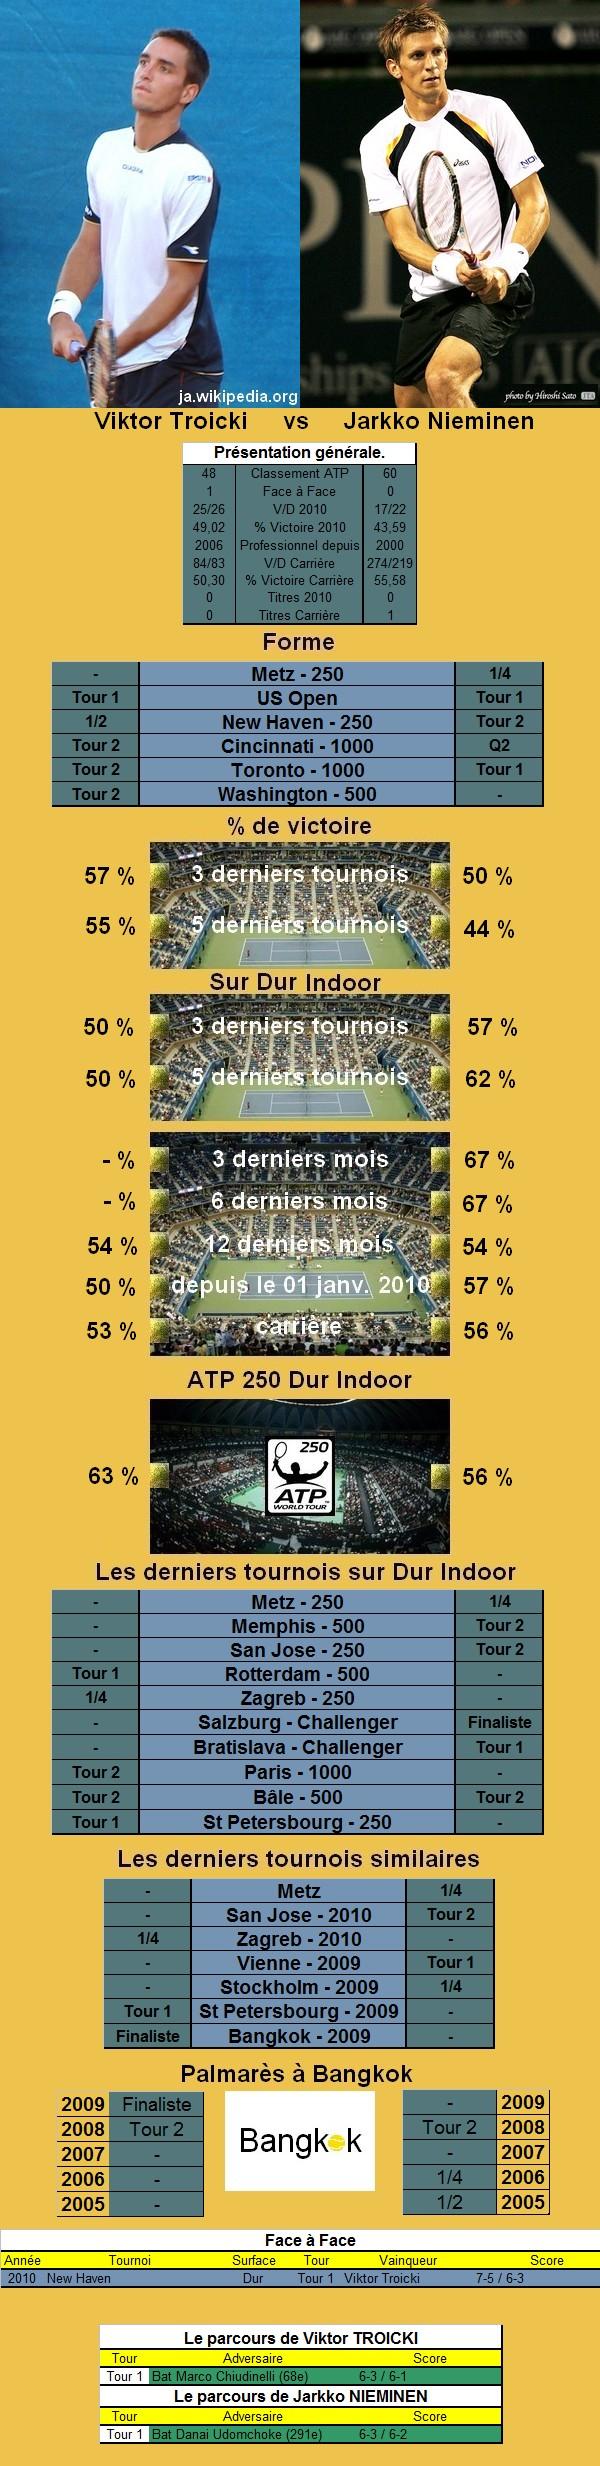 Statistiques tennis de Troicki contre Nieminen à Bangkok